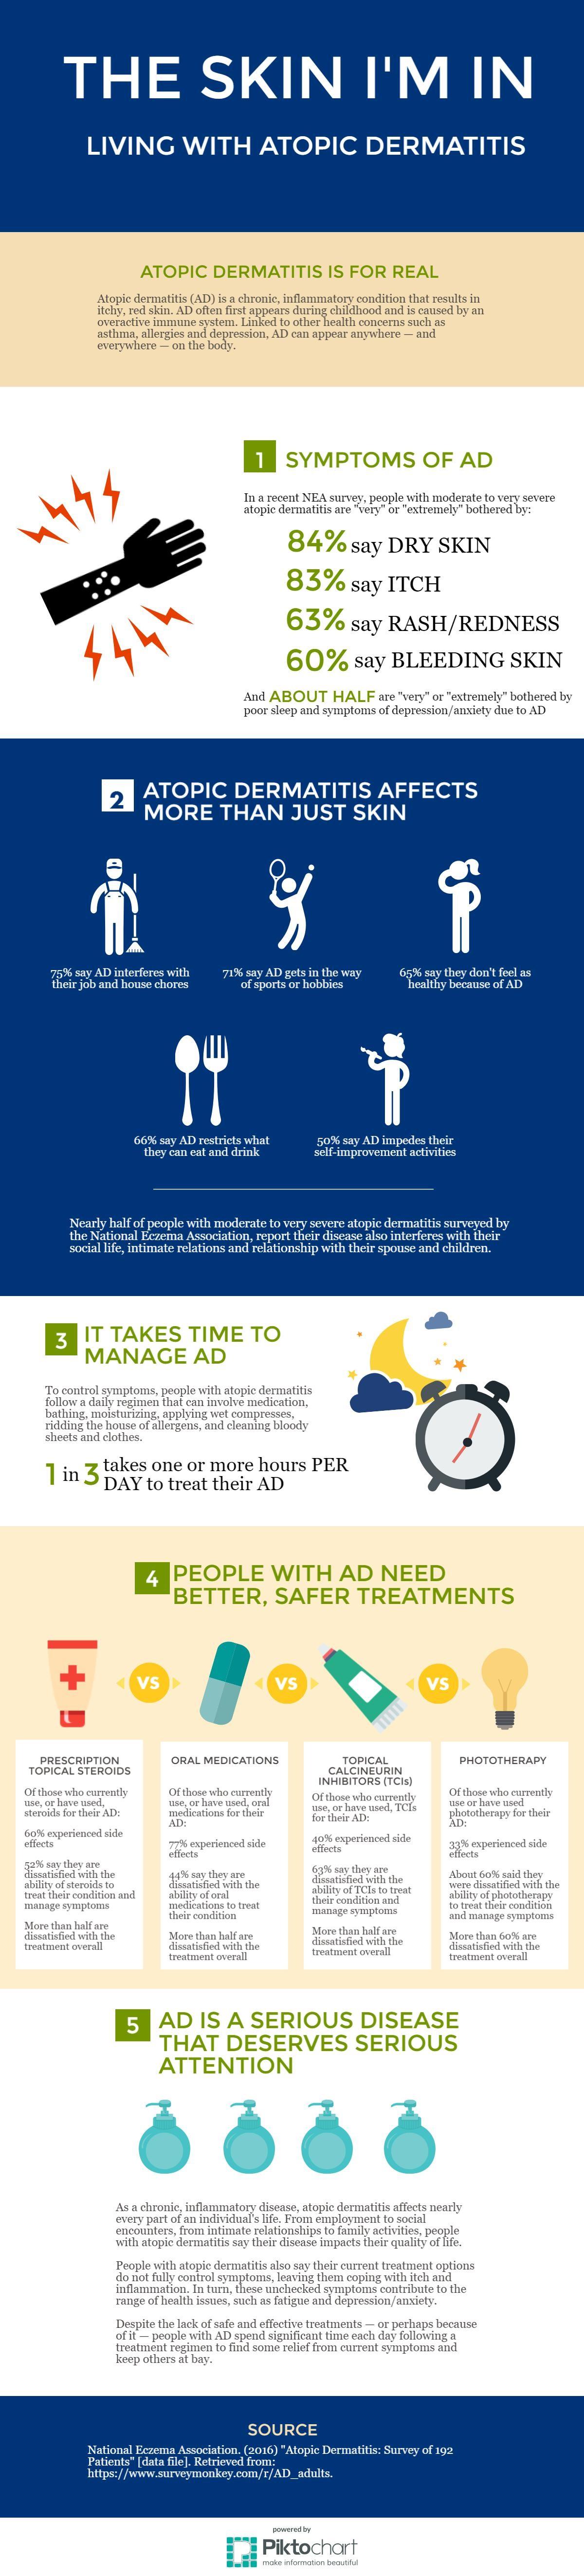 nea-ad-survey-infographic-updated